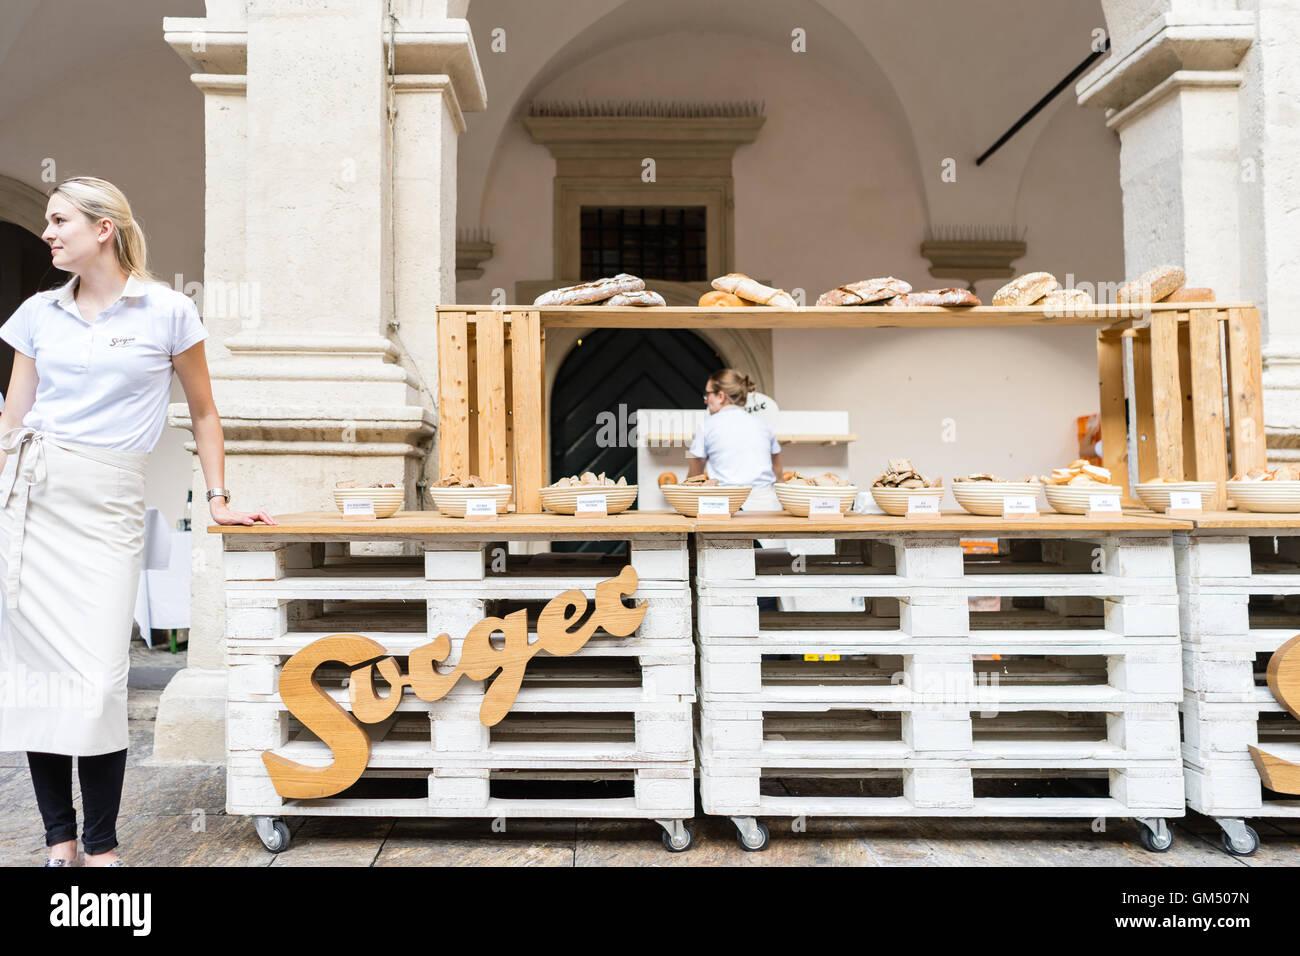 La selezione di diversi tipi di pane a lunga tavola - Lange Tafel der Genusshauptstadt Graz Immagini Stock